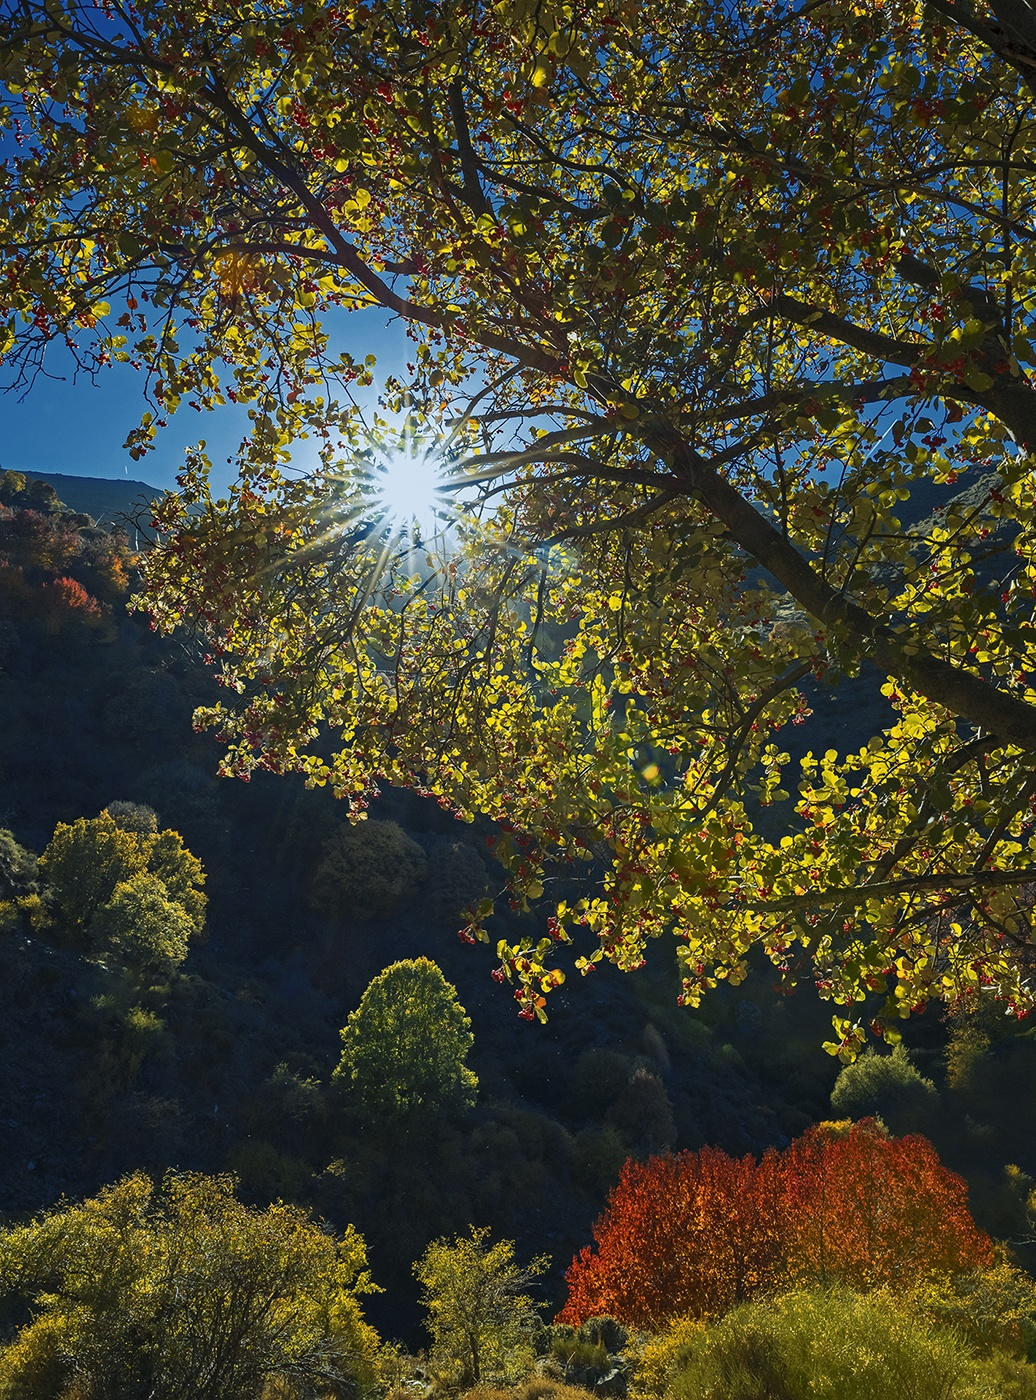 Sierra Nevada - Mediterranean light - Peter Manschot Al Andalus Photo Tour, Landscape photography photos prints workshops Andalusia Spain